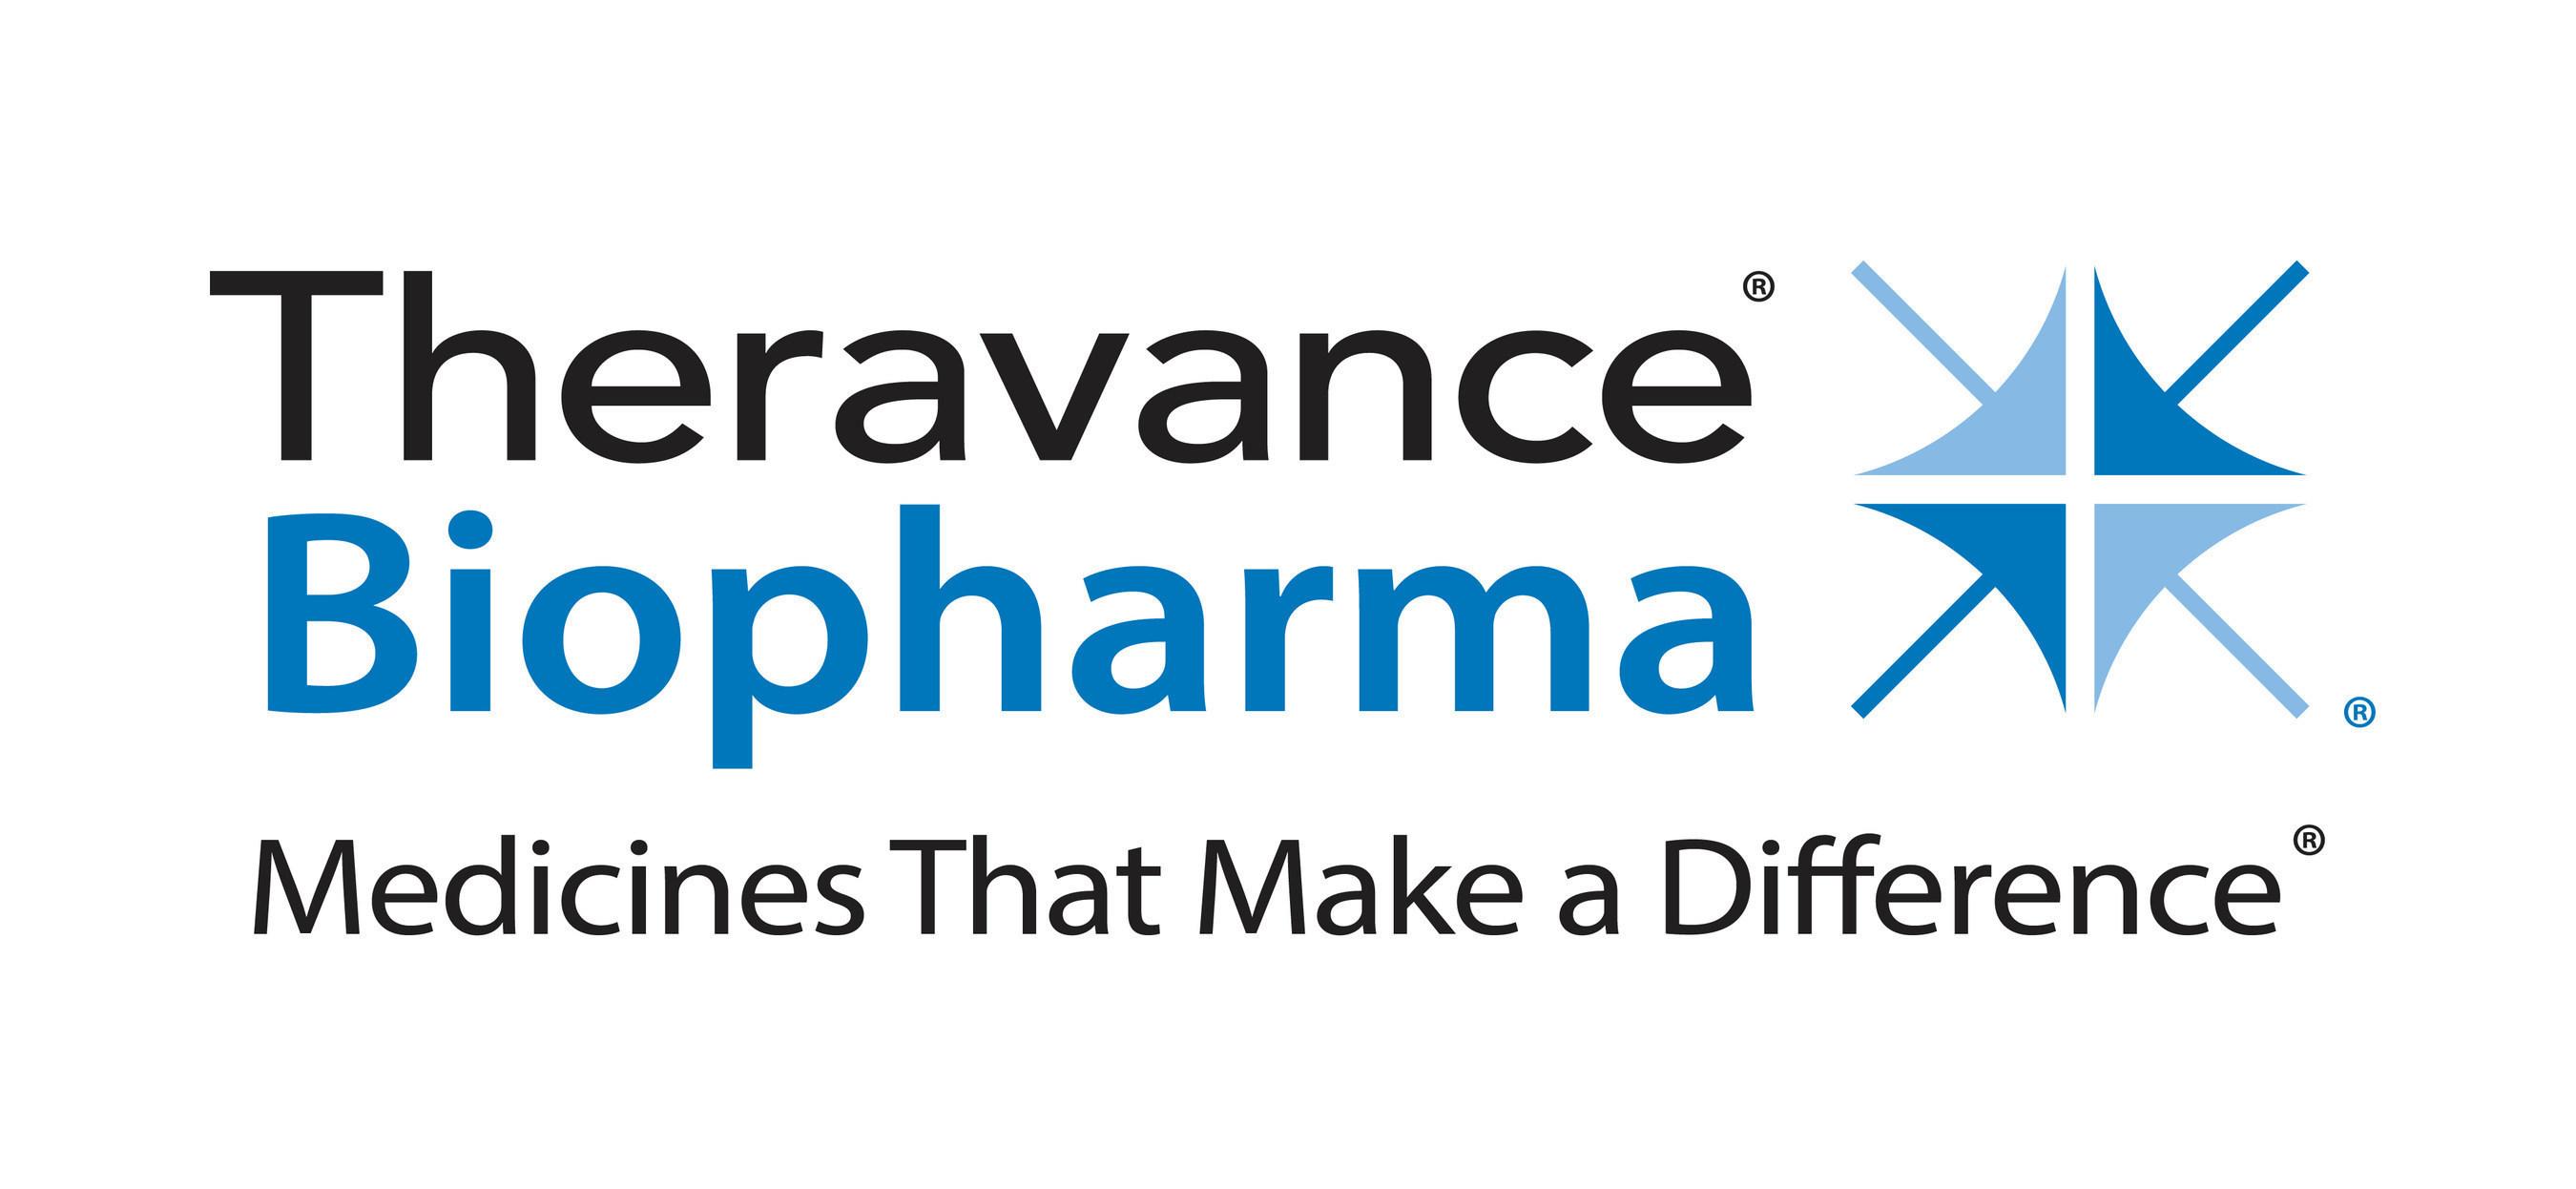 Theravance Biopharma Logo